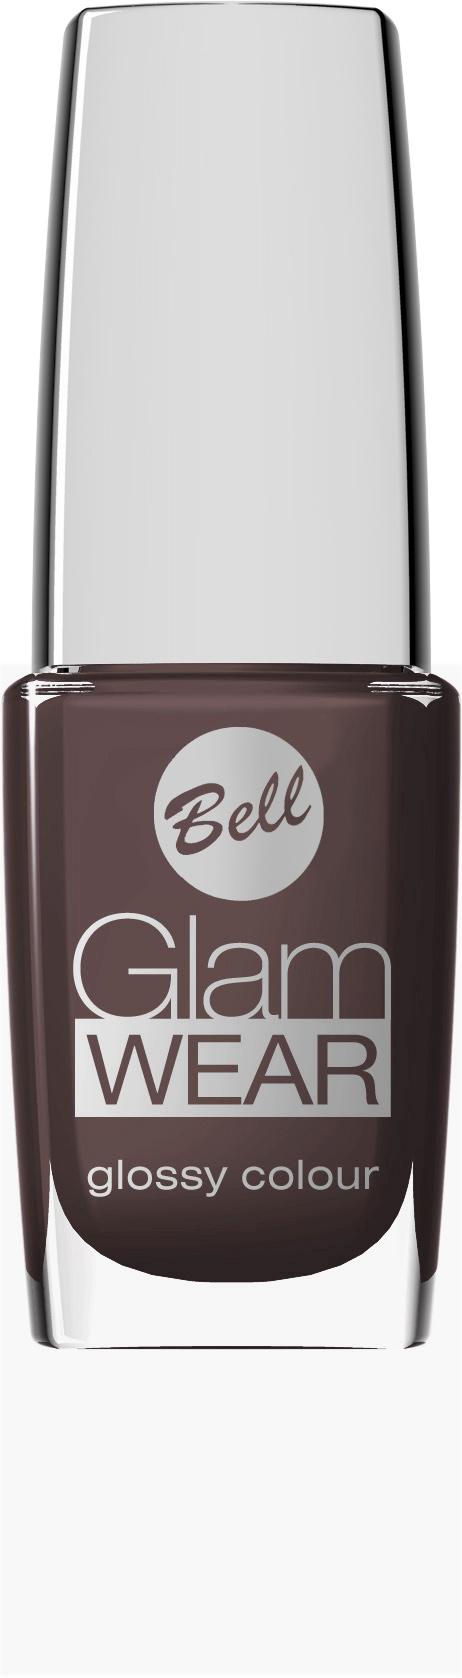 Glam Wear Glossy Colour Nail Enamel